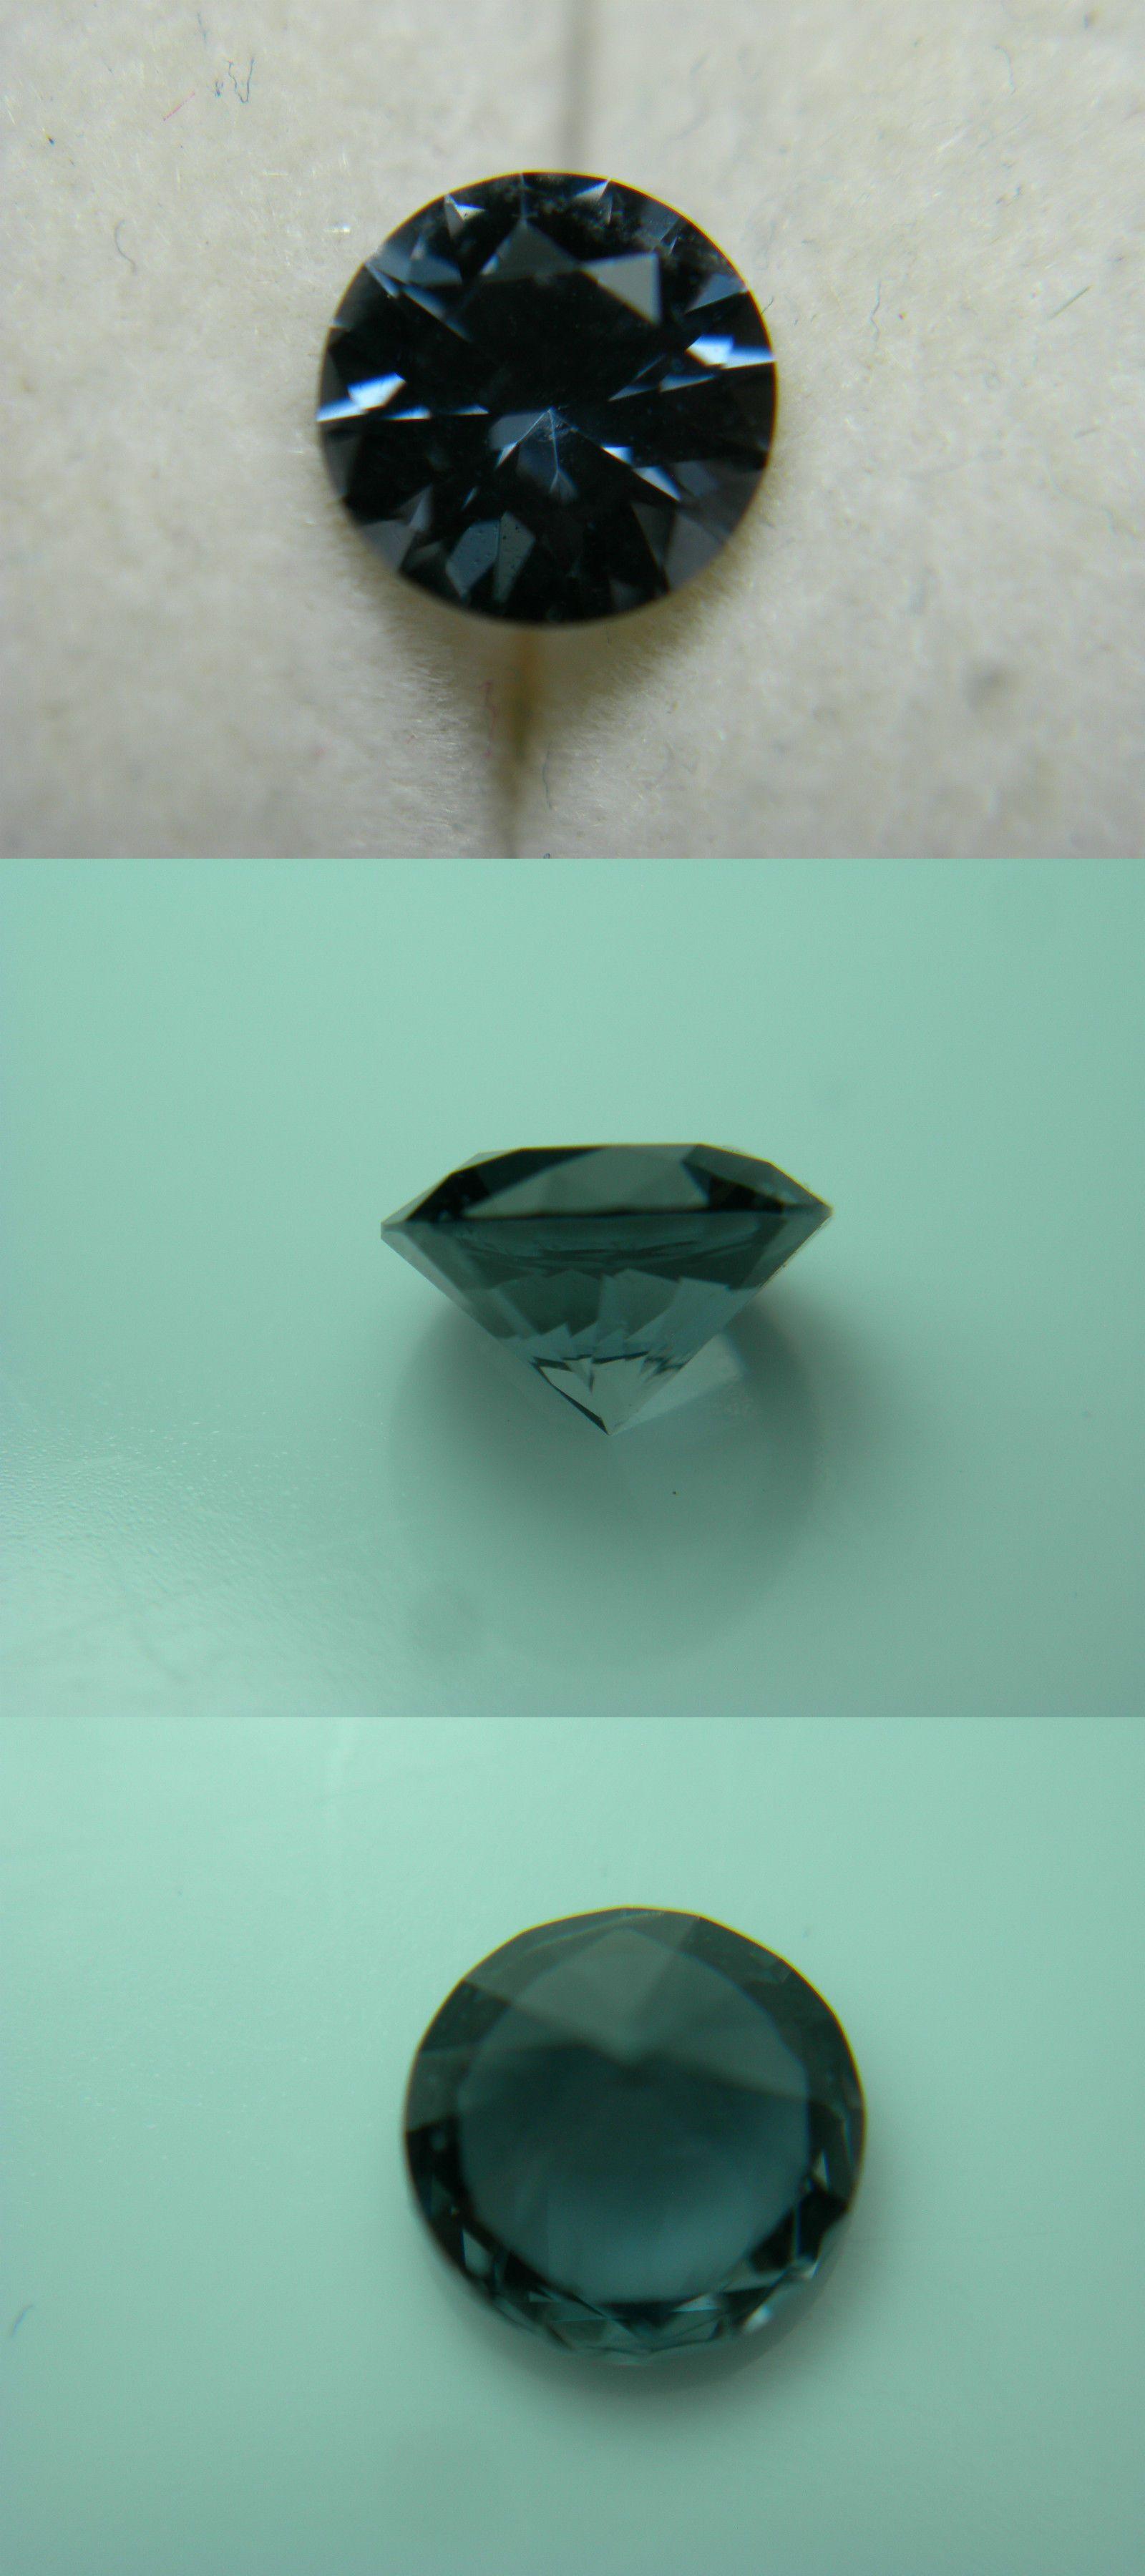 Spinel 110873: Rare Blue Spinel Gem Diamond Cut Rnd Tunduru ...